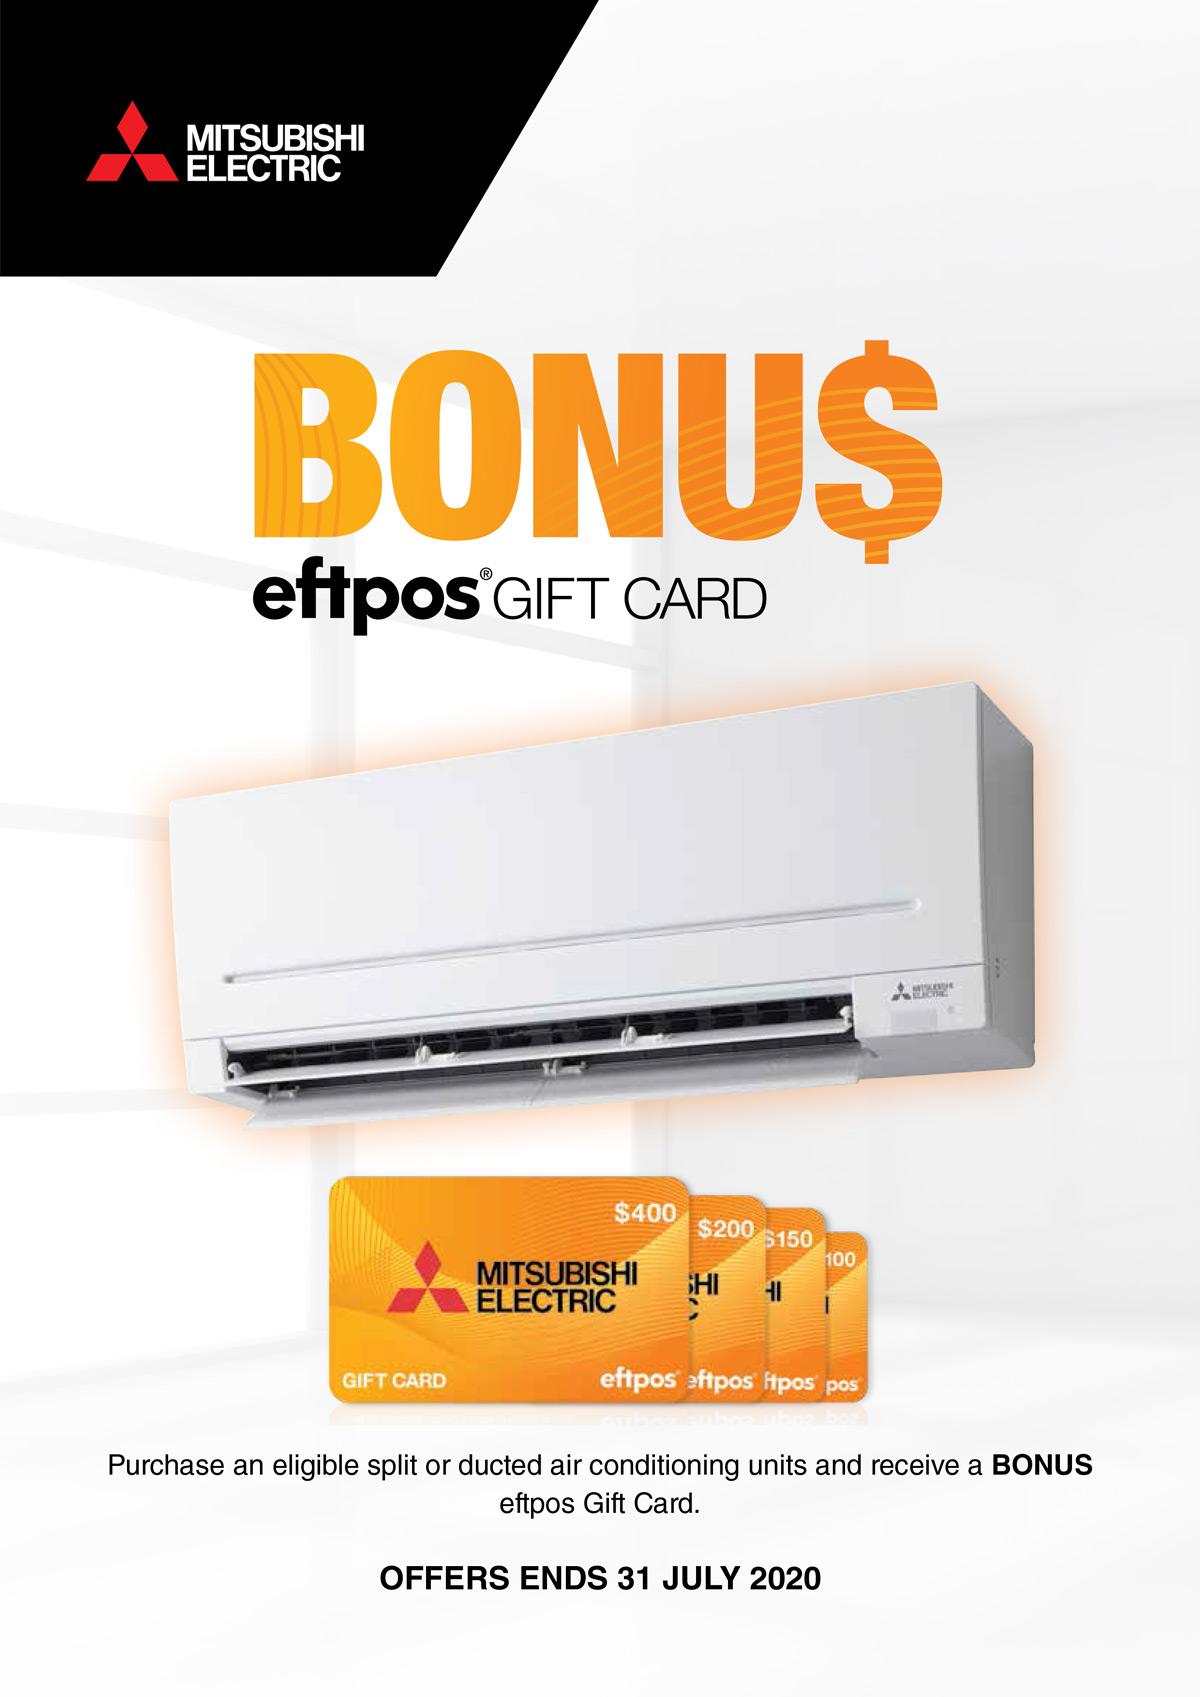 https://www.masteraircon.com.au/wp-content/uploads/2020/05/Mitsubishi-Electric-Bonus-Eftpos-Promotion-2020-1.jpg